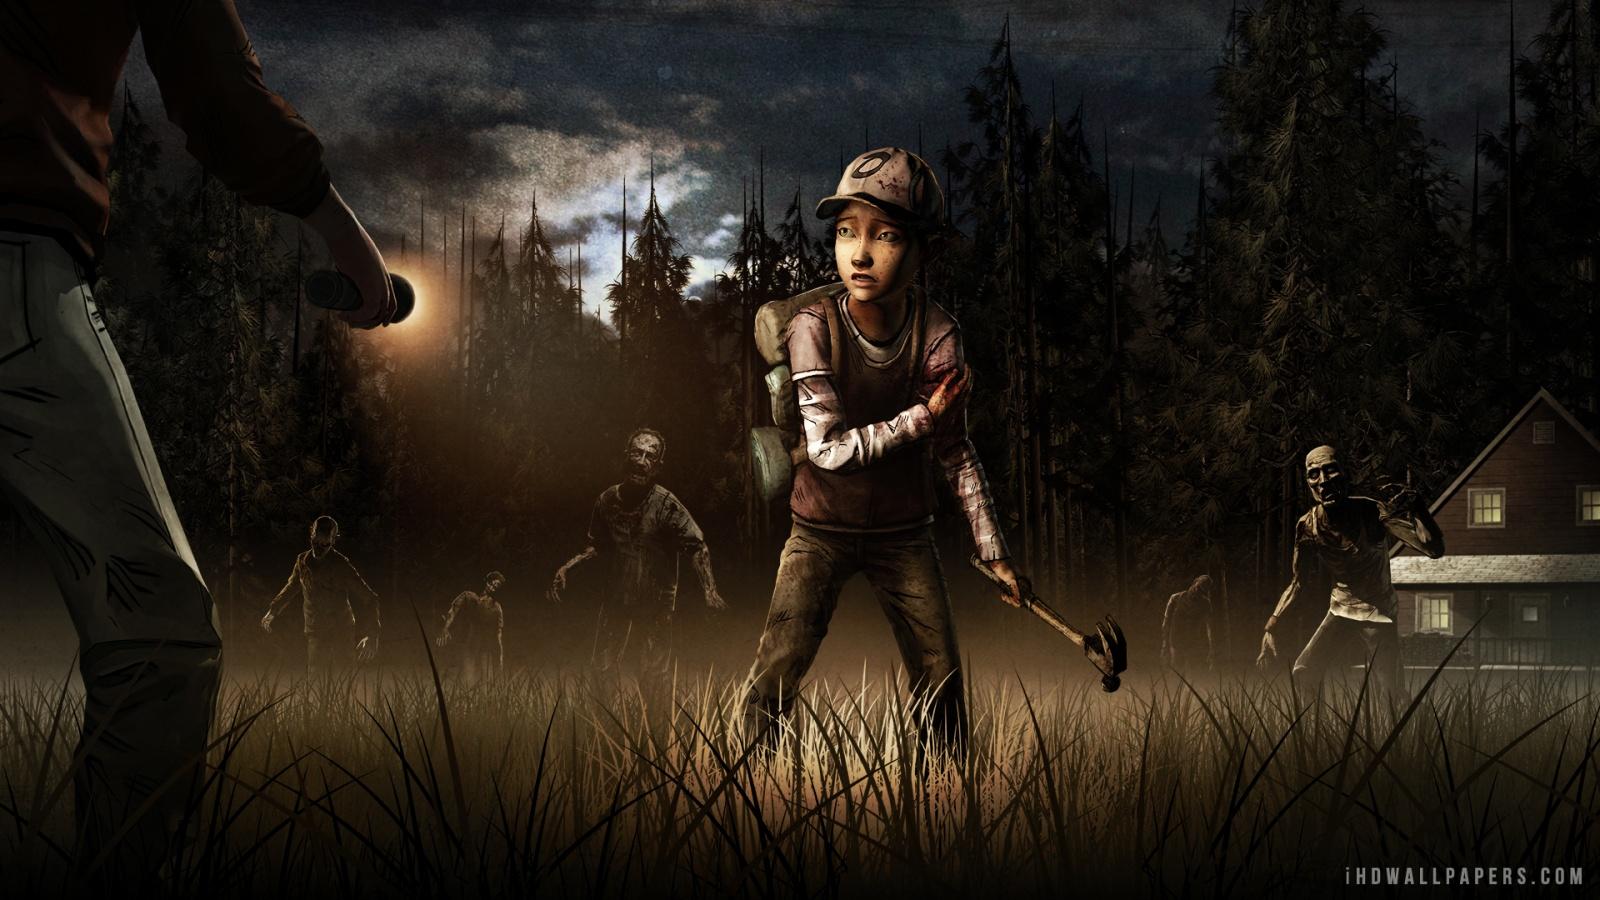 The Walking Dead The Game Season 2 HD Wallpaper   iHD Wallpapers 1600x900